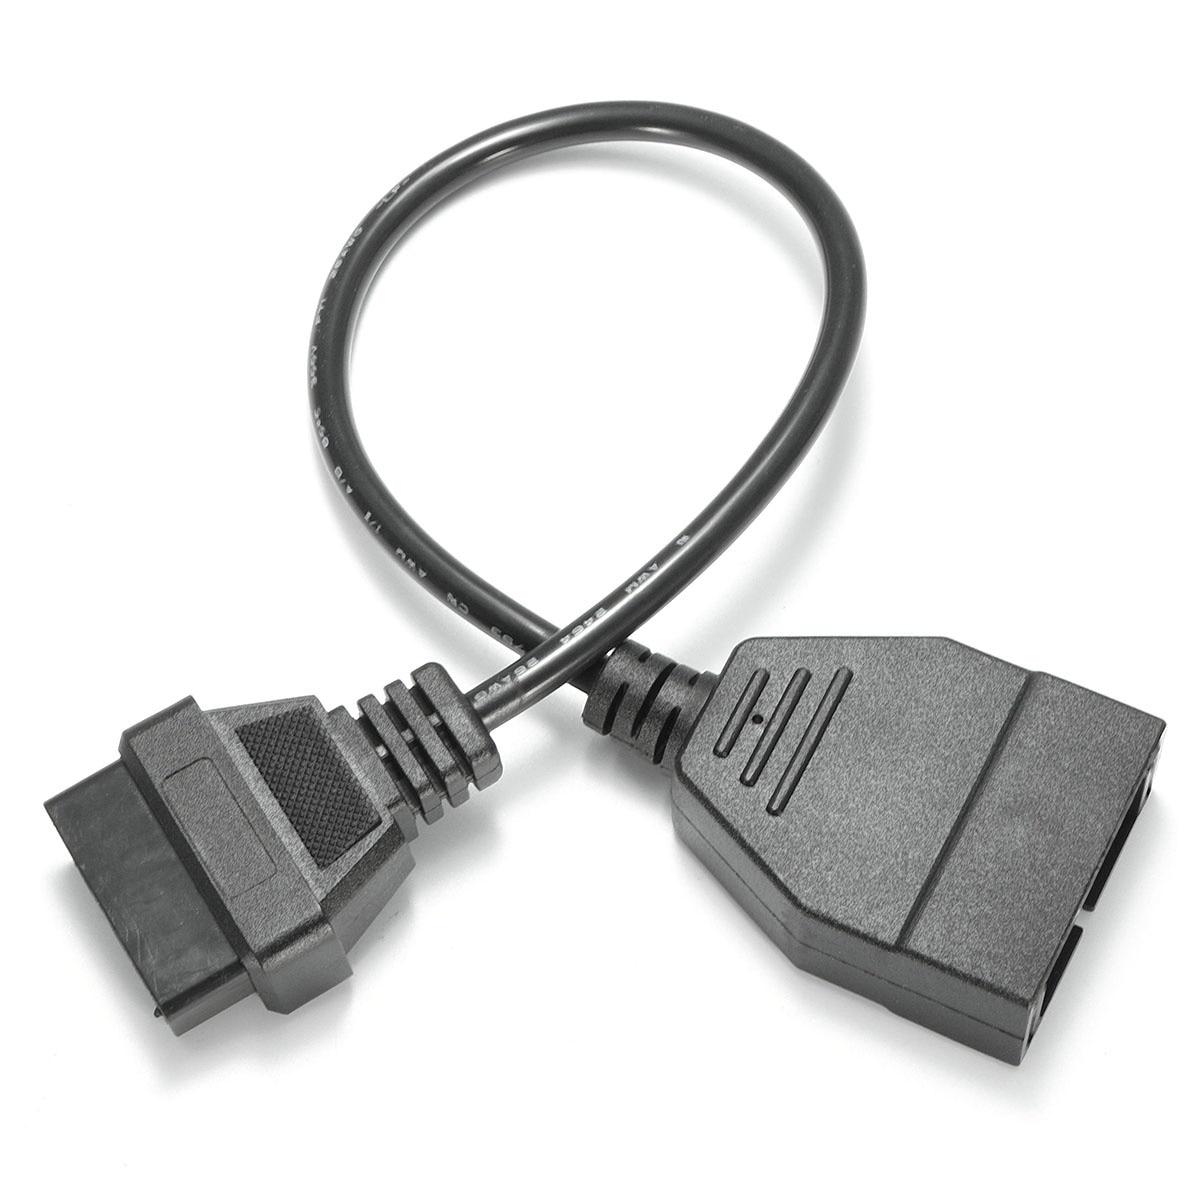 Convertidor adaptador Cable diagnóstico escáner OBD 12 Pin OBD1 a 16 Pin OBD2 convertidor adaptador Cable diagnóstico escáner Coche Mini portátil ELM327 V2.1 OBD2 II Bluetooth diagnóstico coche Auto interfaz escáner azul Premium ABS herramienta de diagnóstico